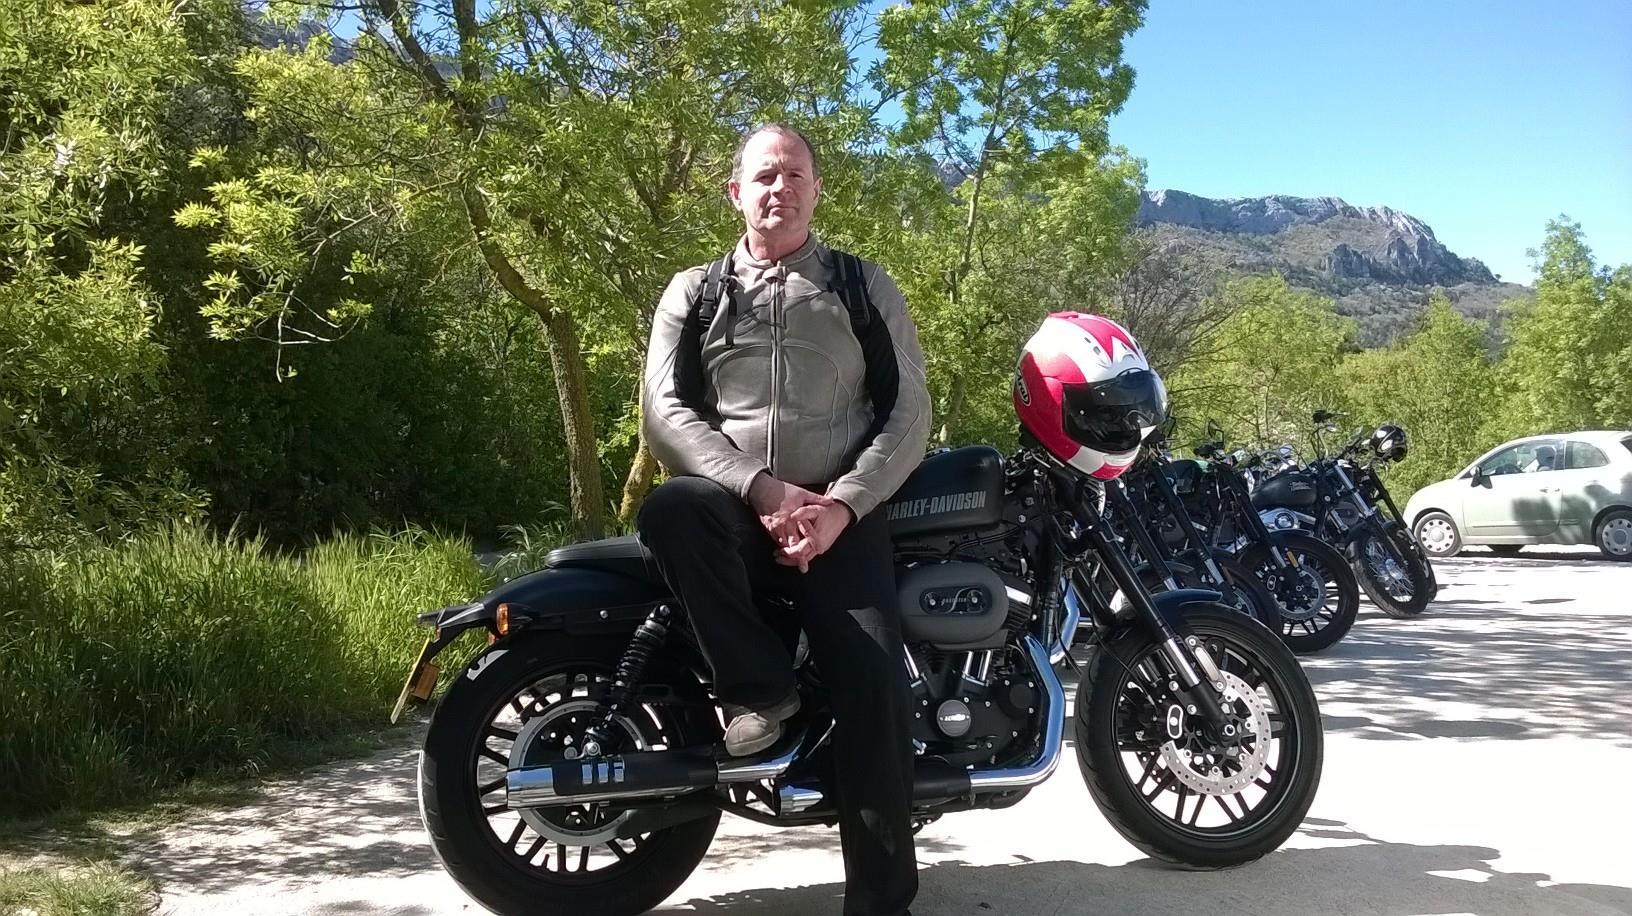 Harley Davidson Roadster First Ride